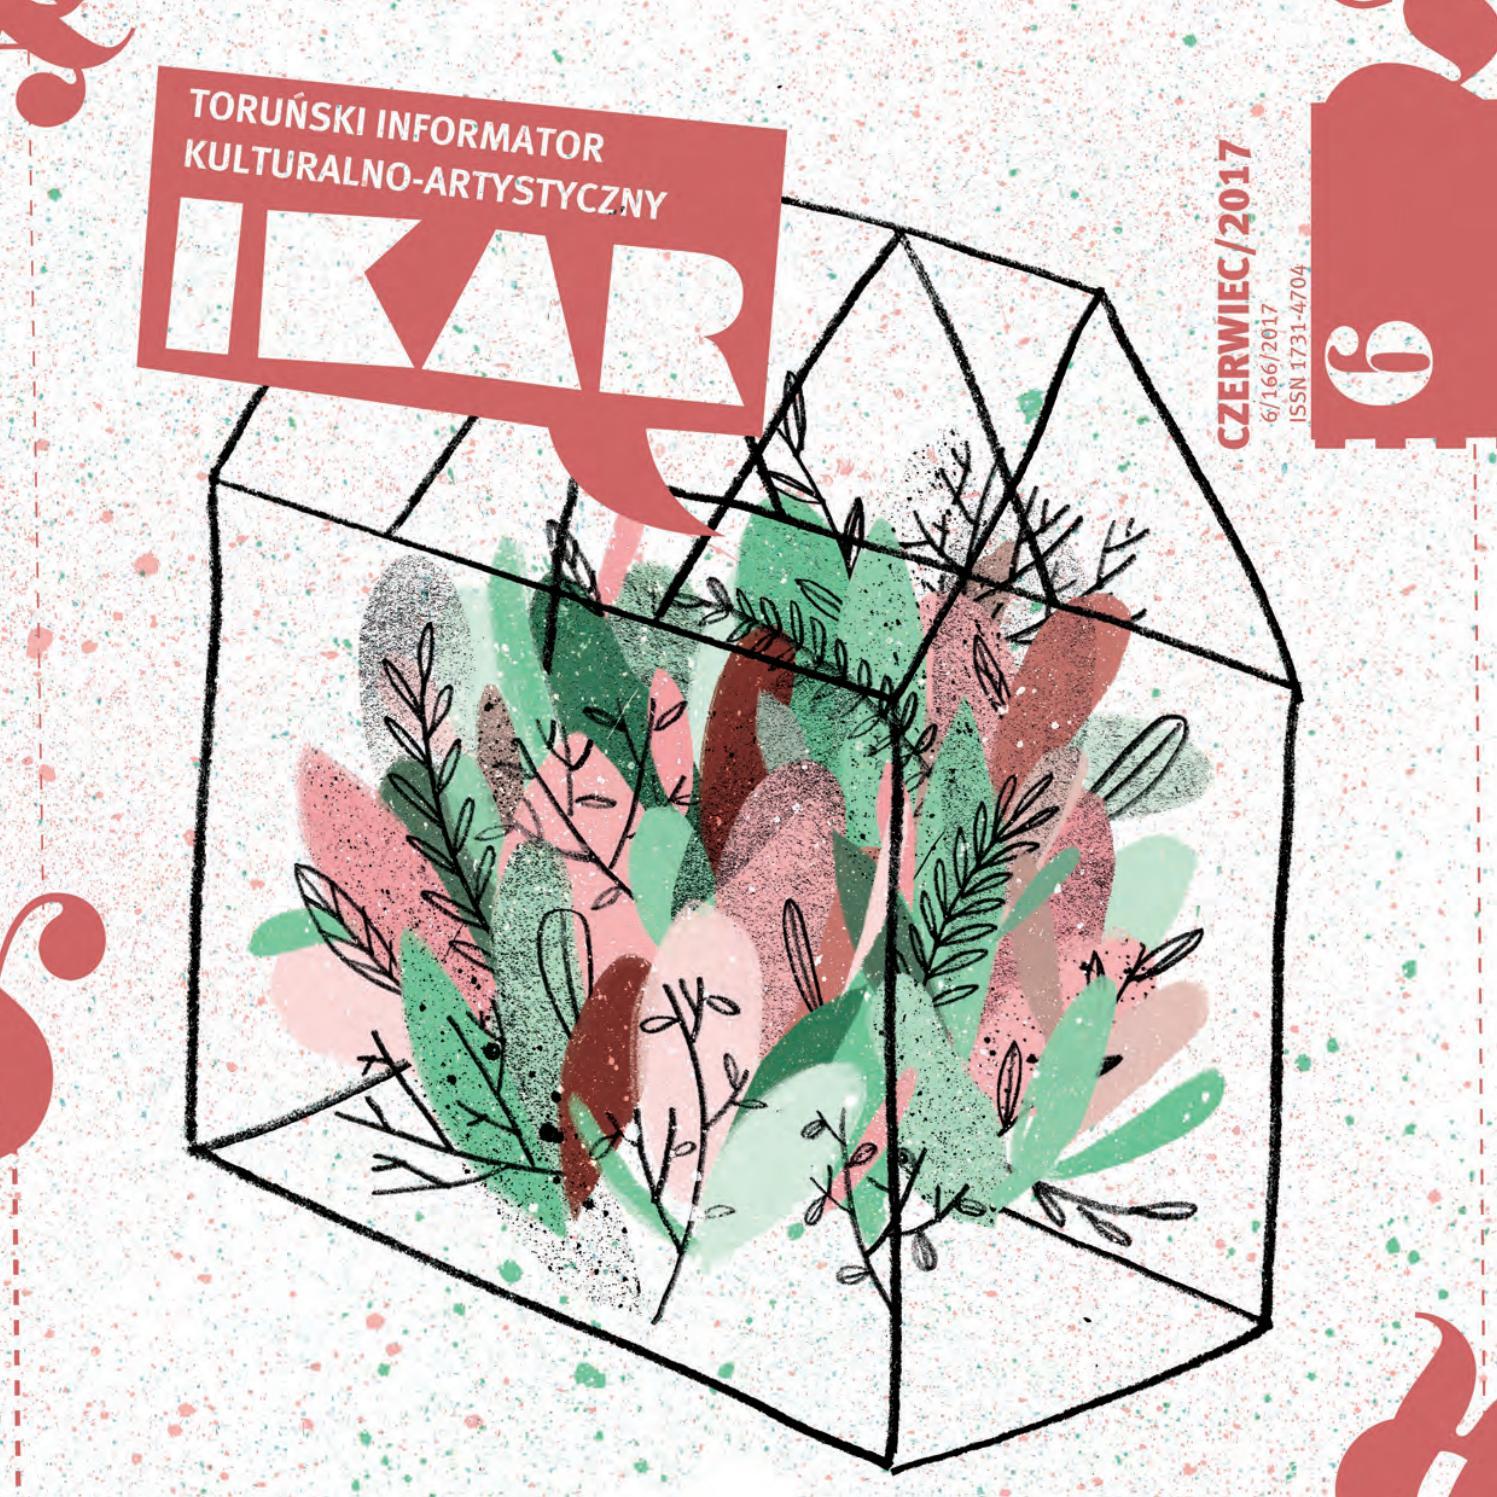 Ikar 61662017 By Toruński Informator Kulturalno